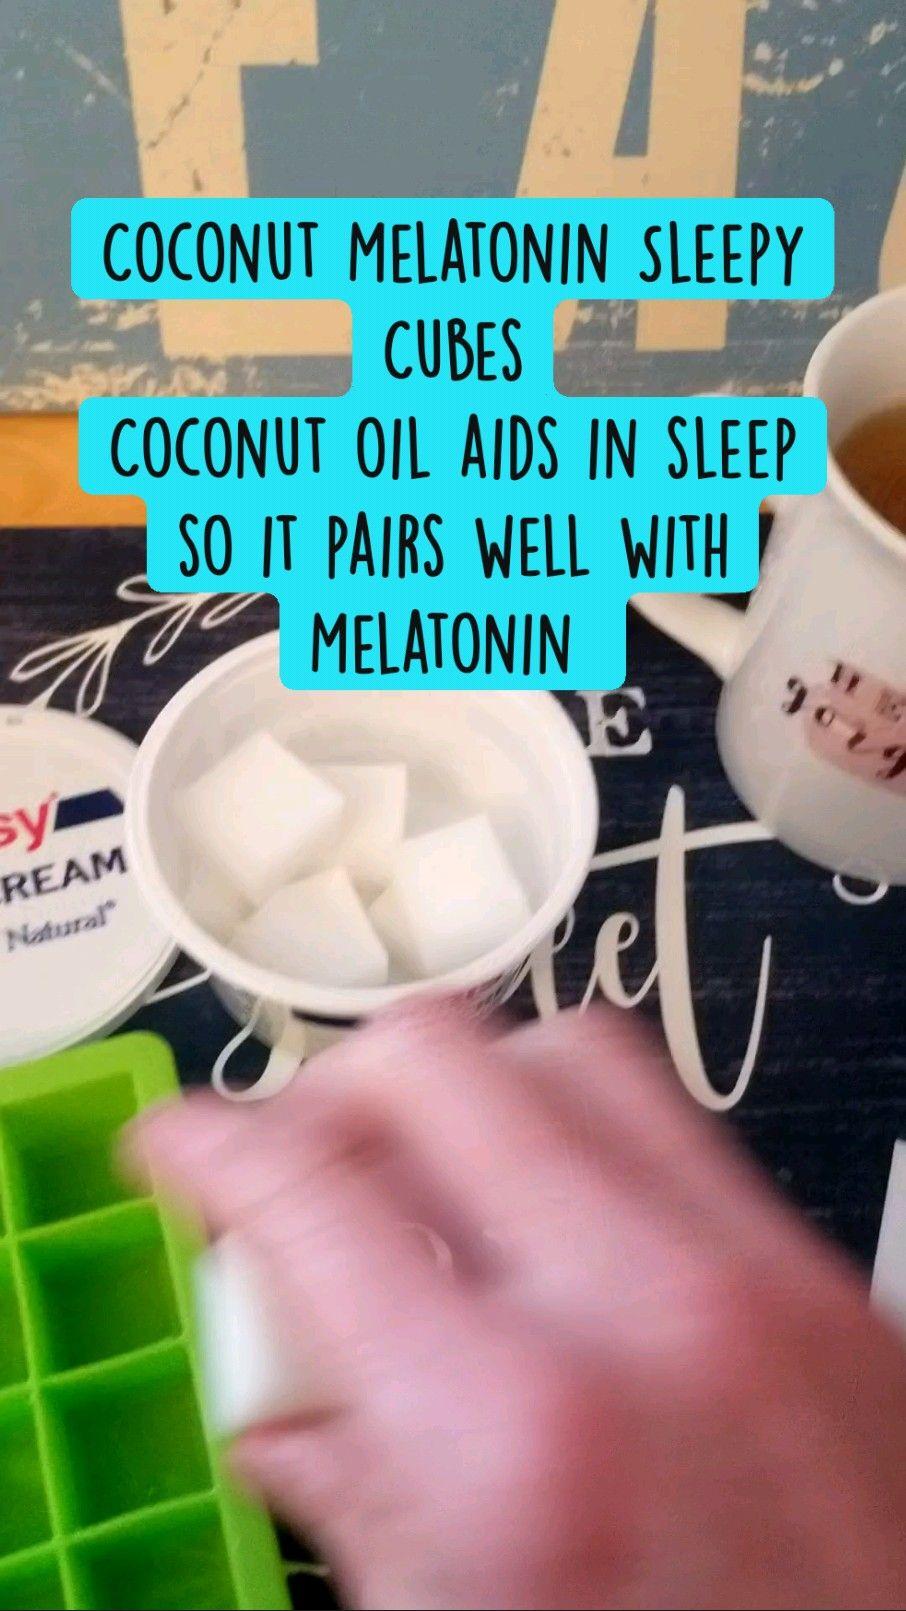 Coconut Melatonin Sleepy Cubes